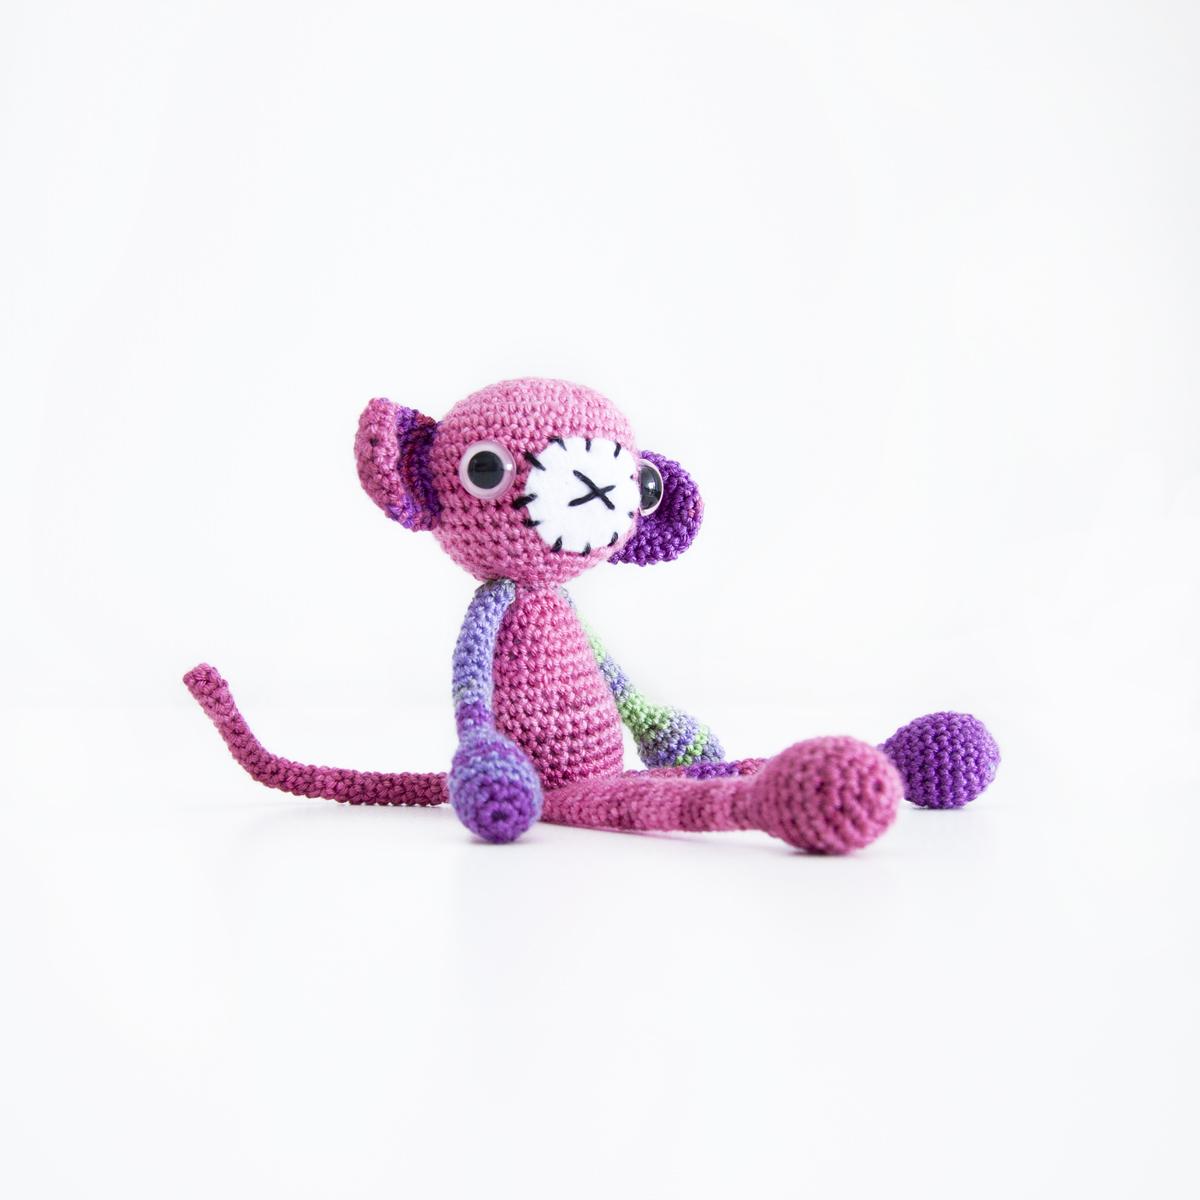 free-monkey-crochet-pattern-bruno-the-monkey-amigurumi-pattern ...   1200x1200